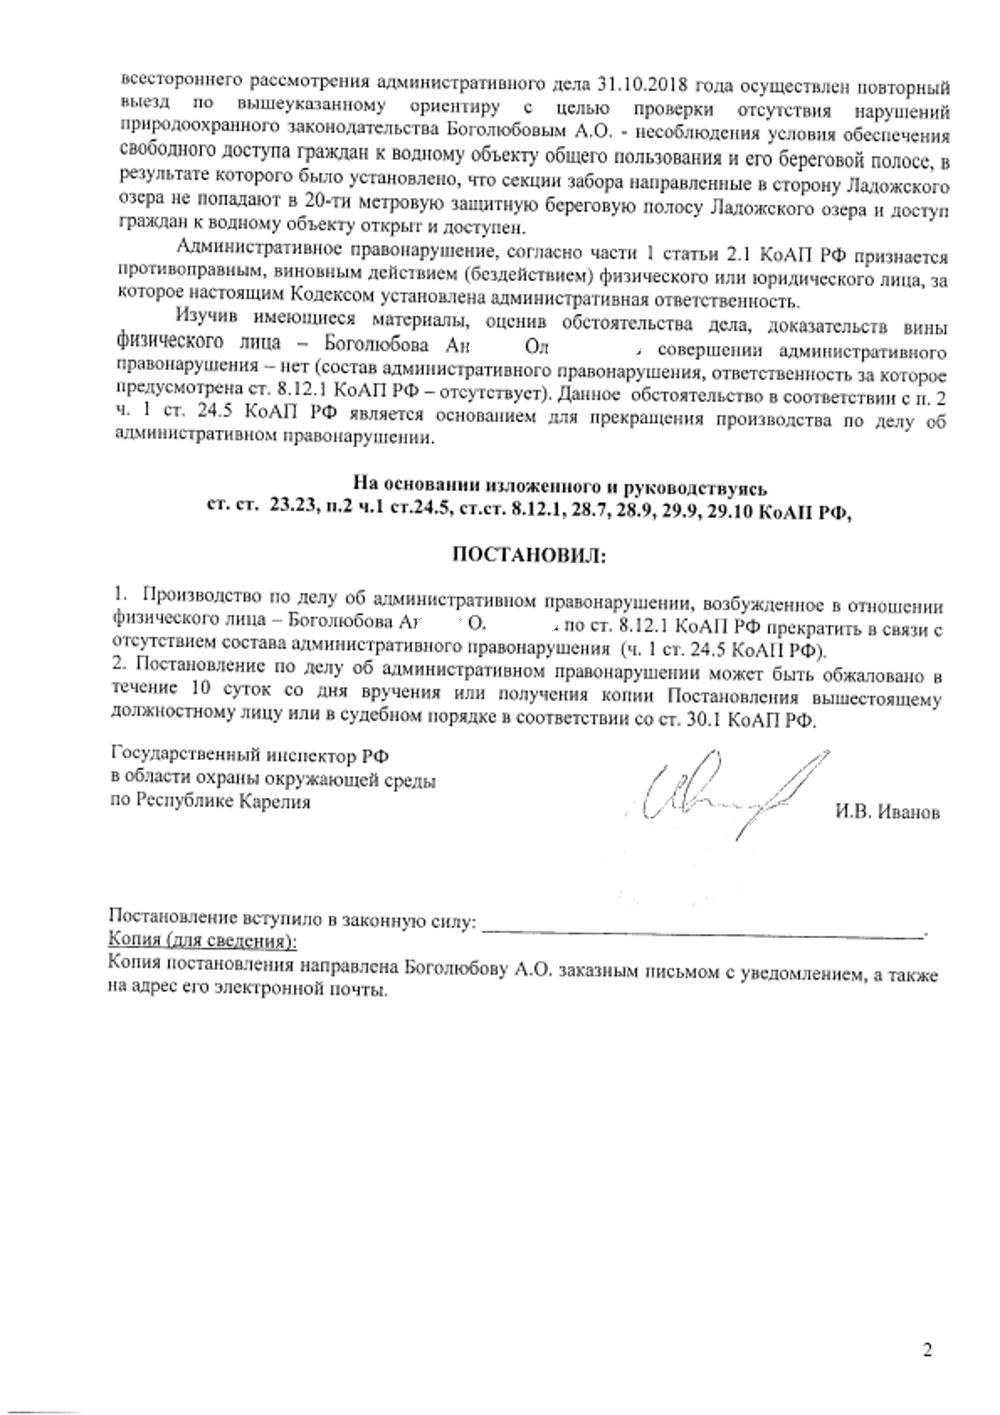 https://sontgranit.ru/forum/img/sokol/рпн3.png